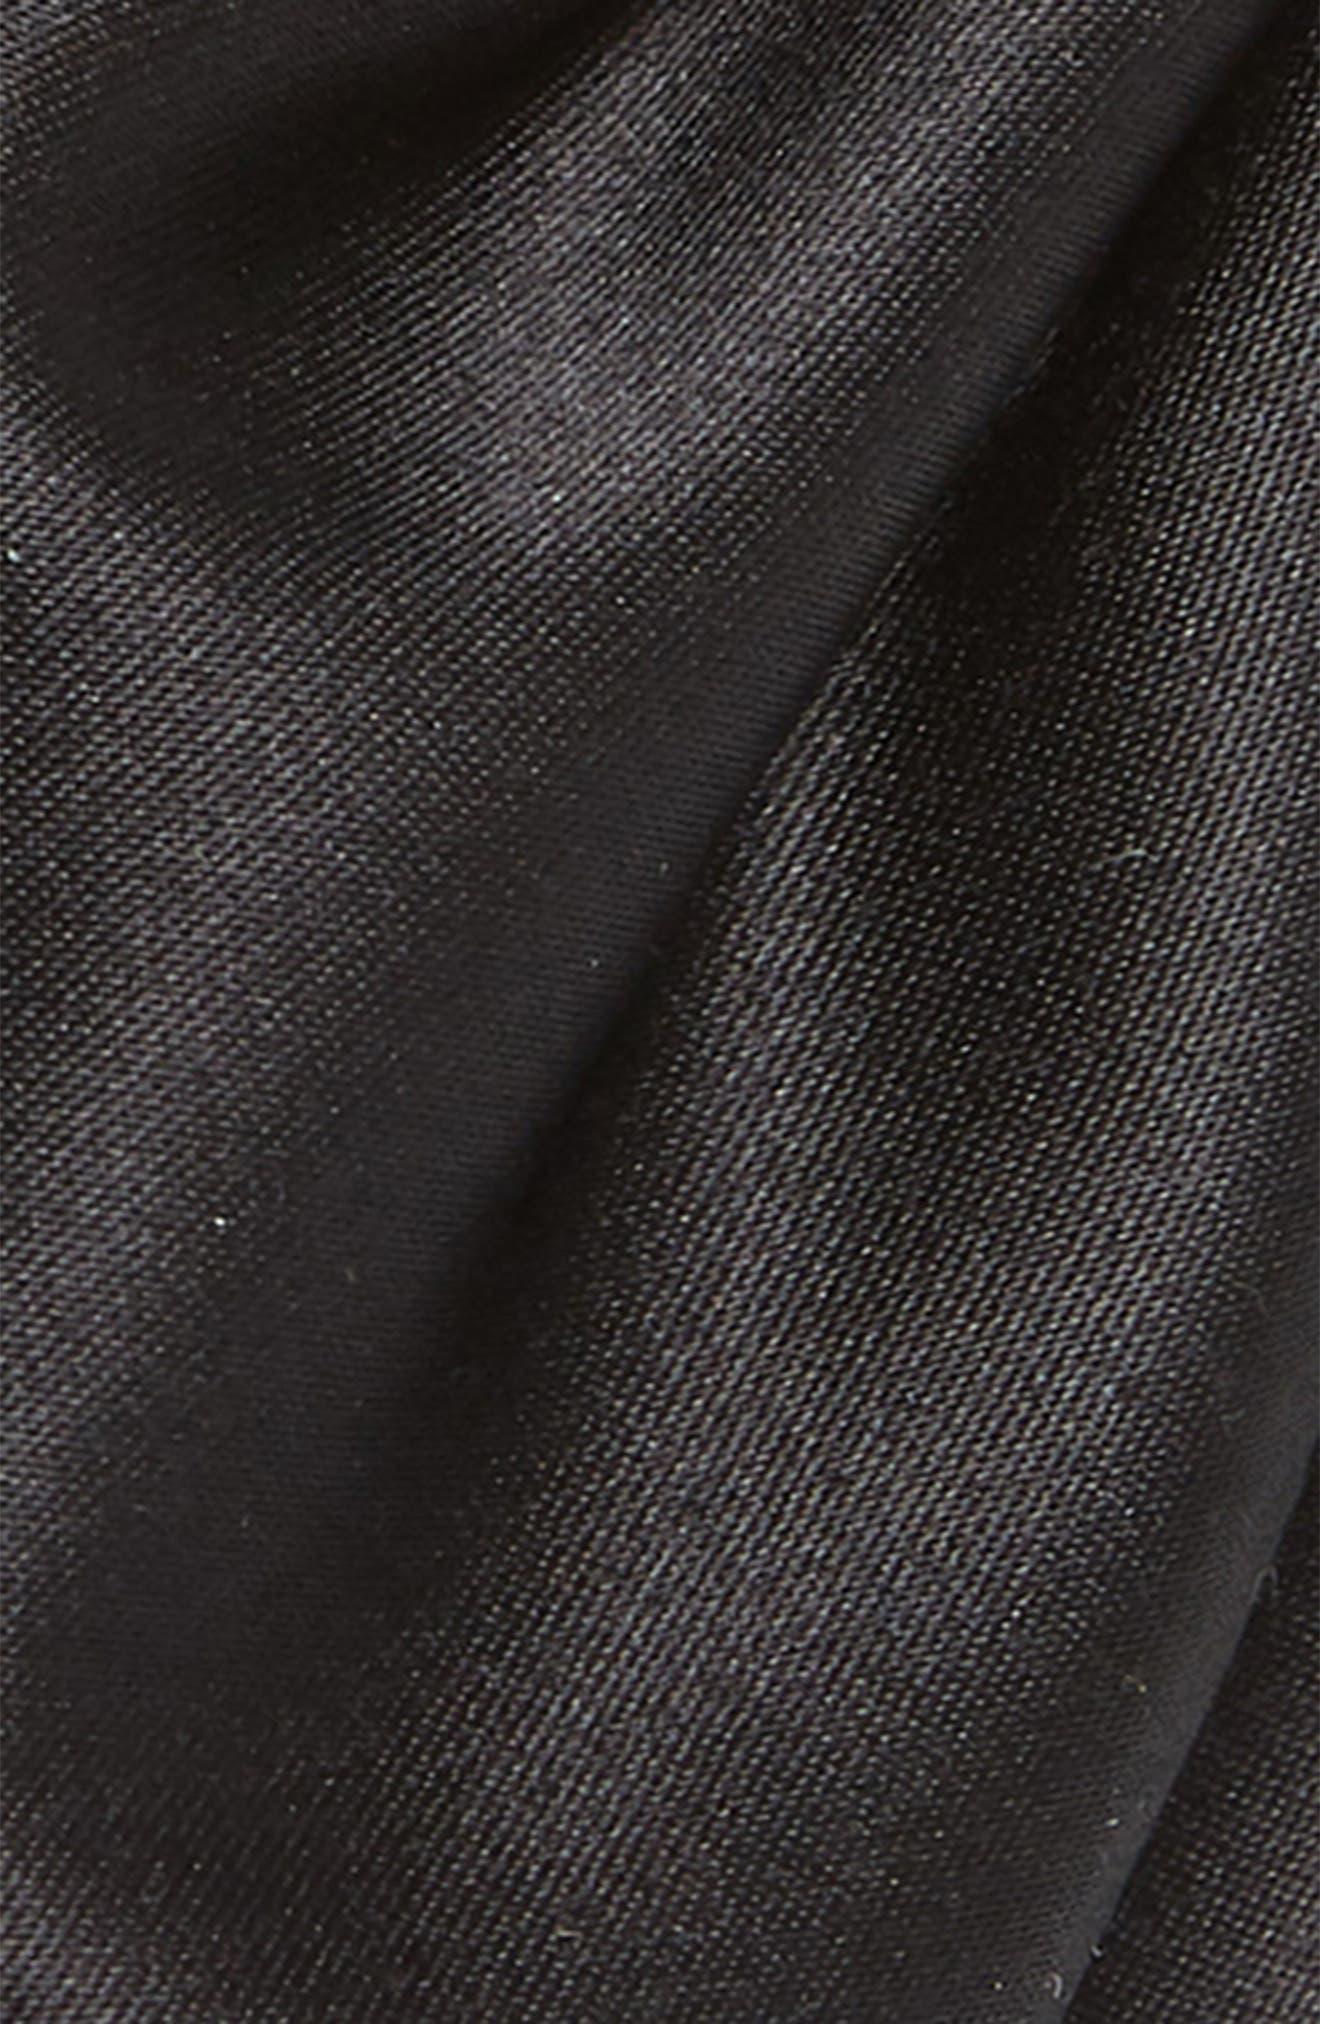 Satin Bow Headband,                             Alternate thumbnail 2, color,                             BLACK